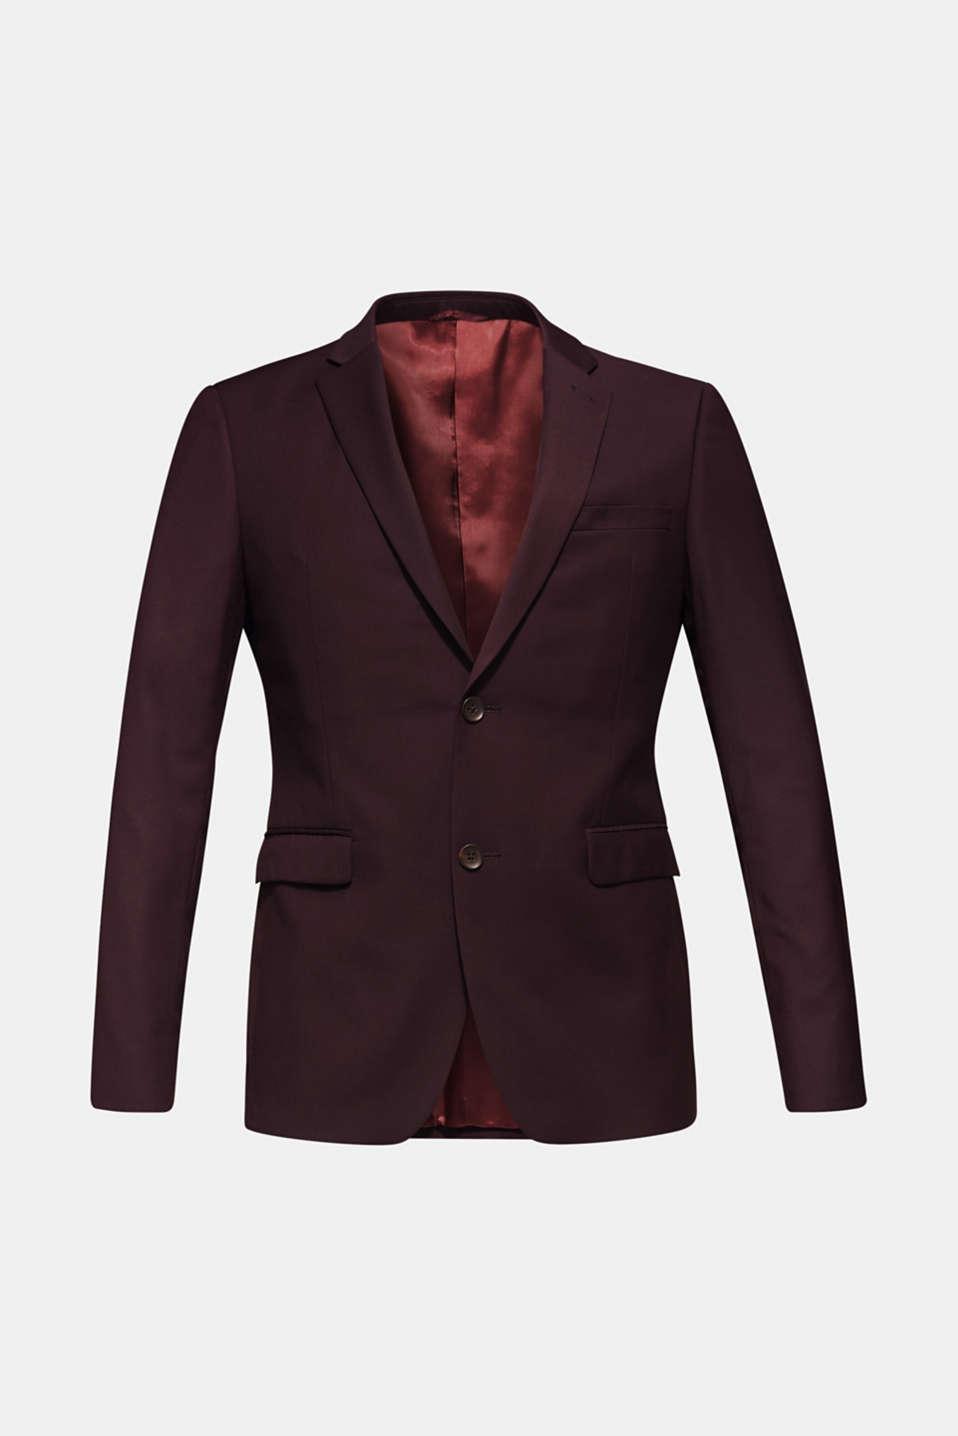 Blazers suit, BORDEAUX RED, detail image number 7